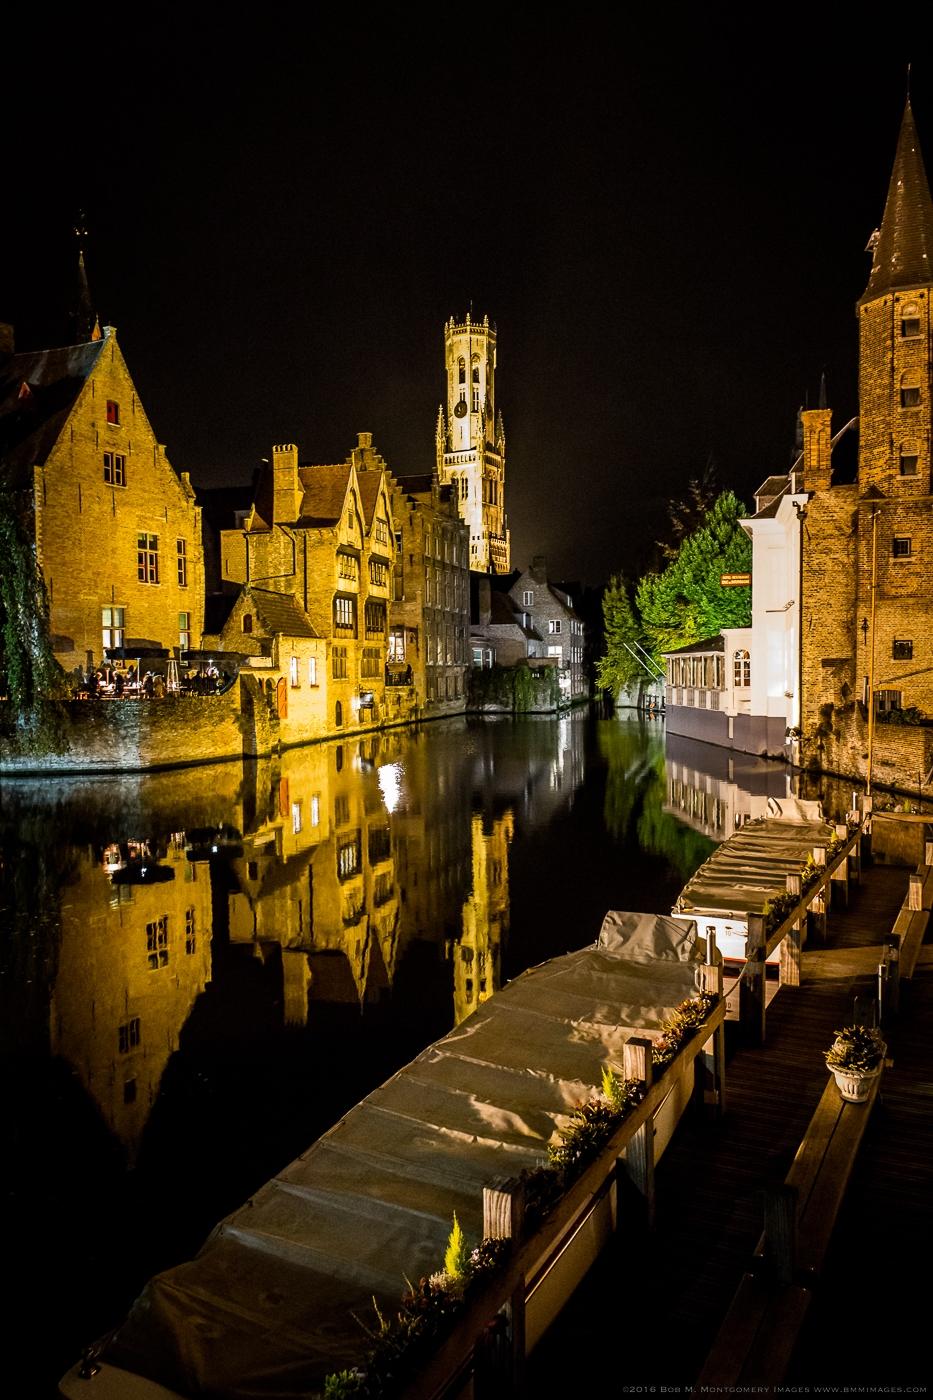 Belgium 20121103 - 0019.jpg